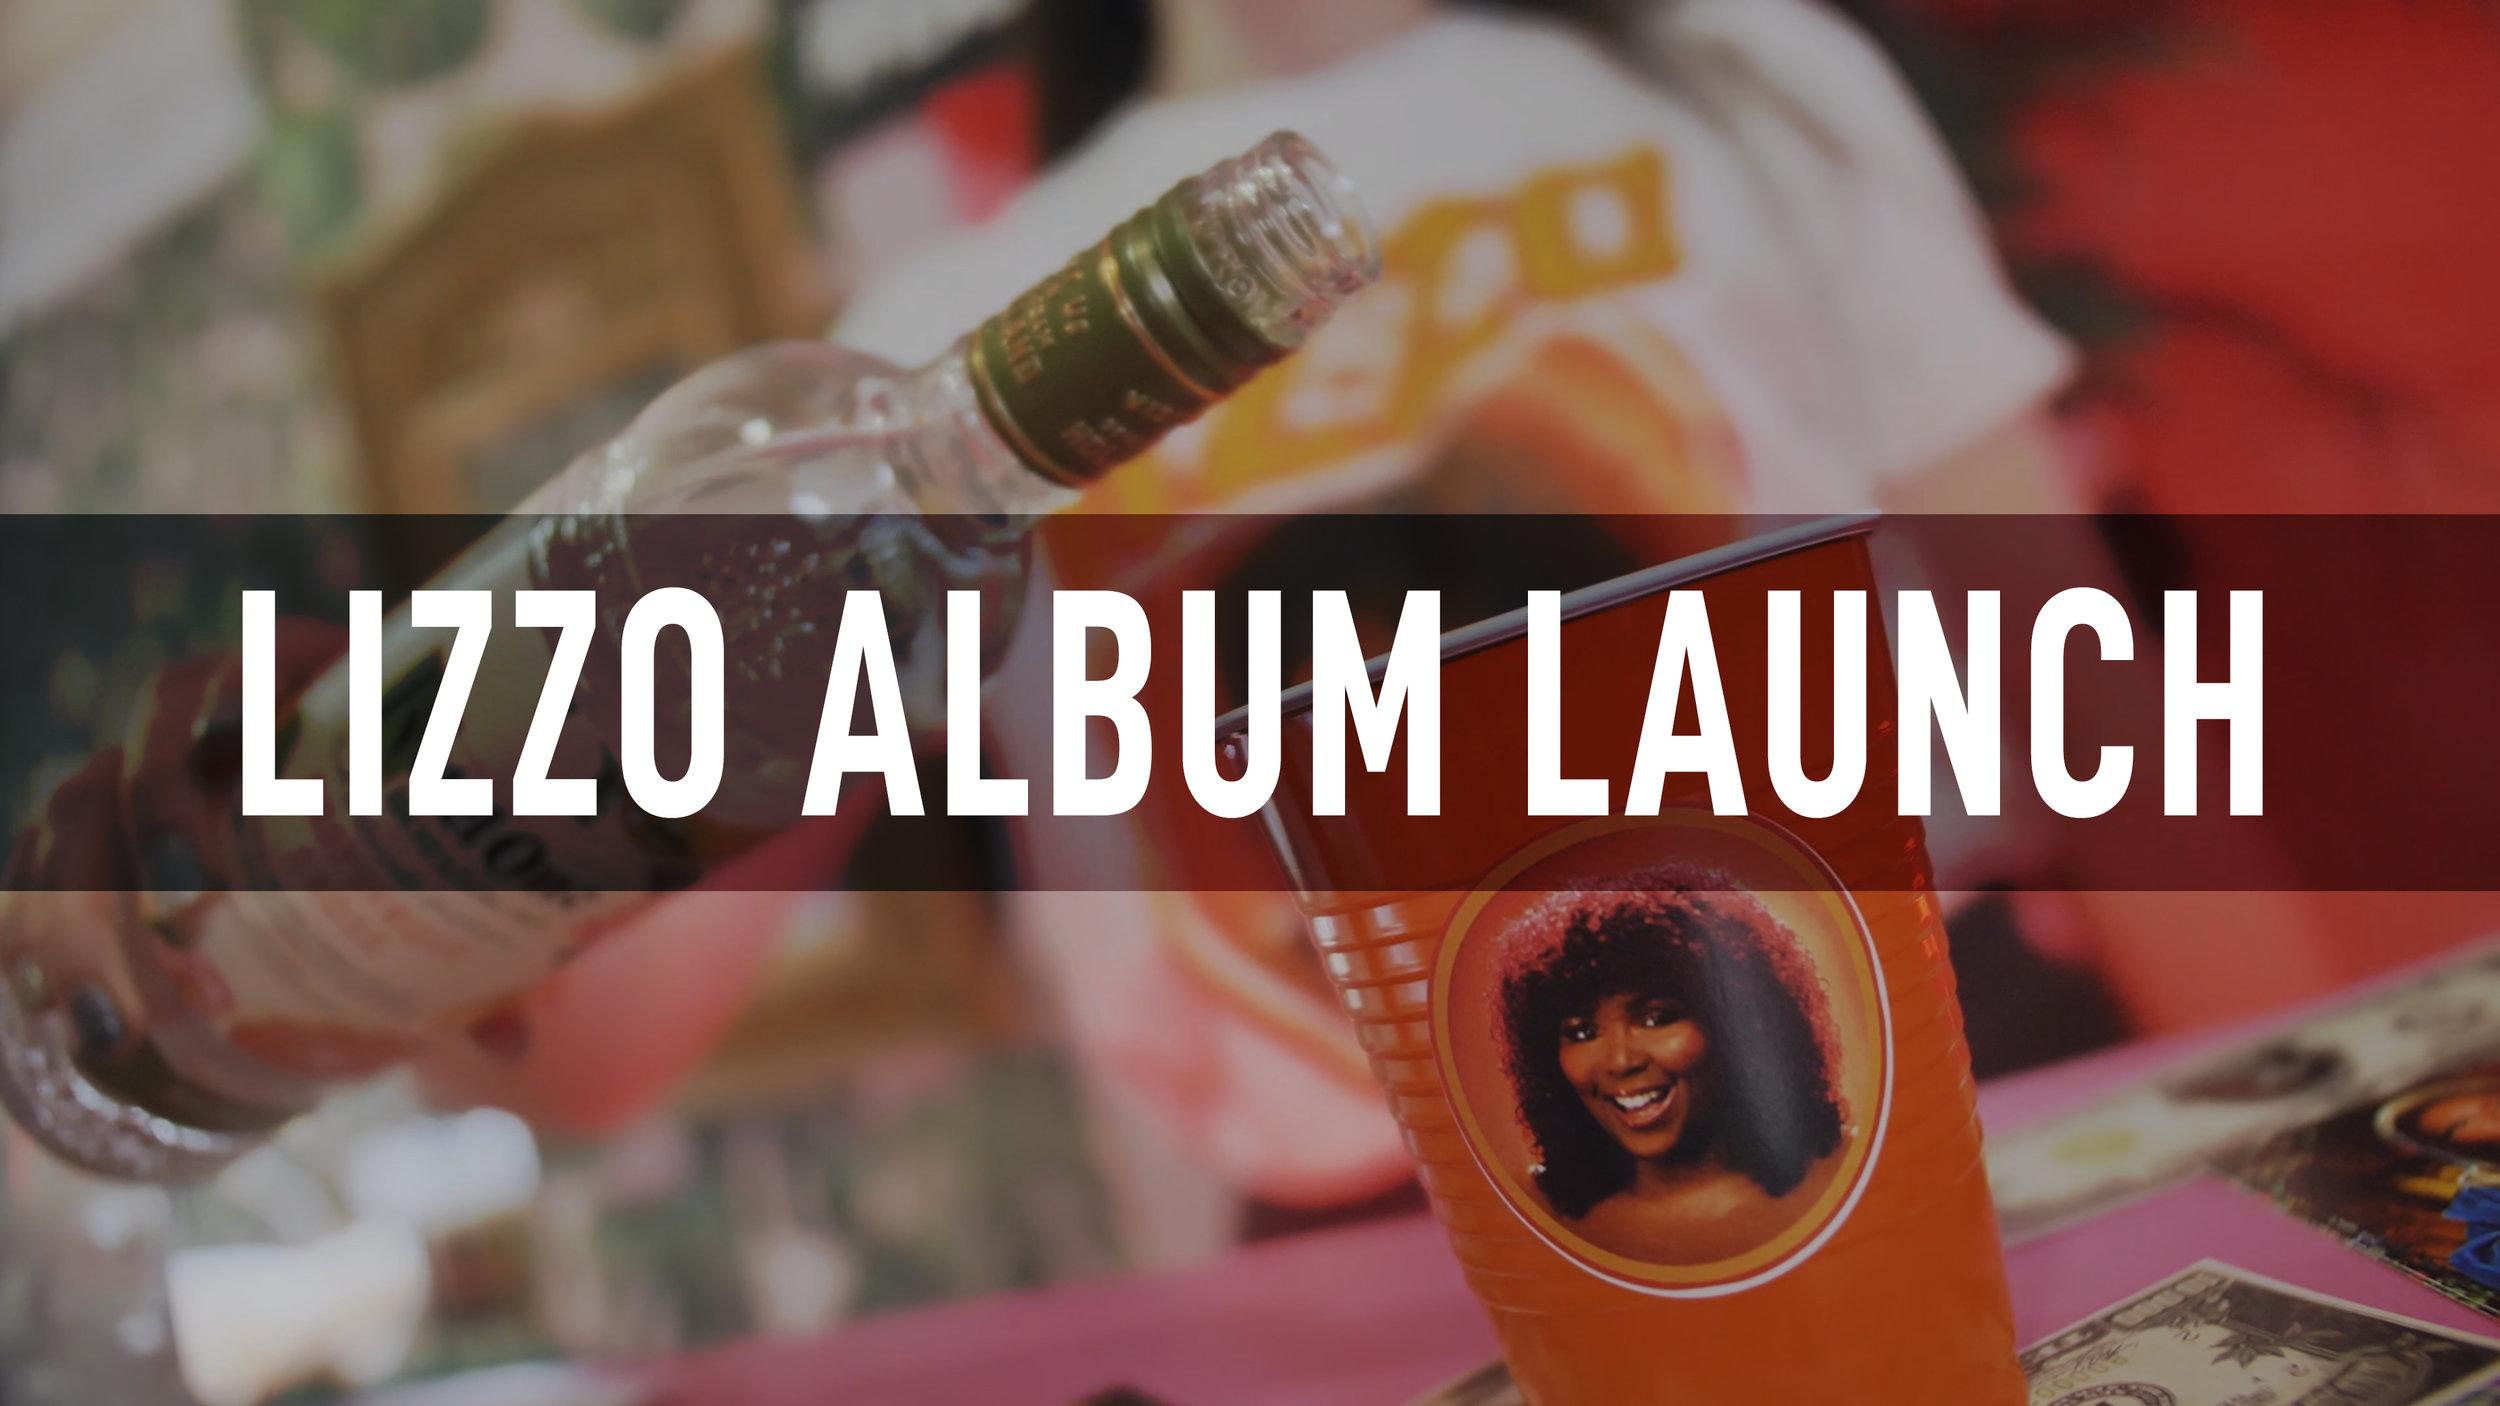 Lizzo Album Launch 2019